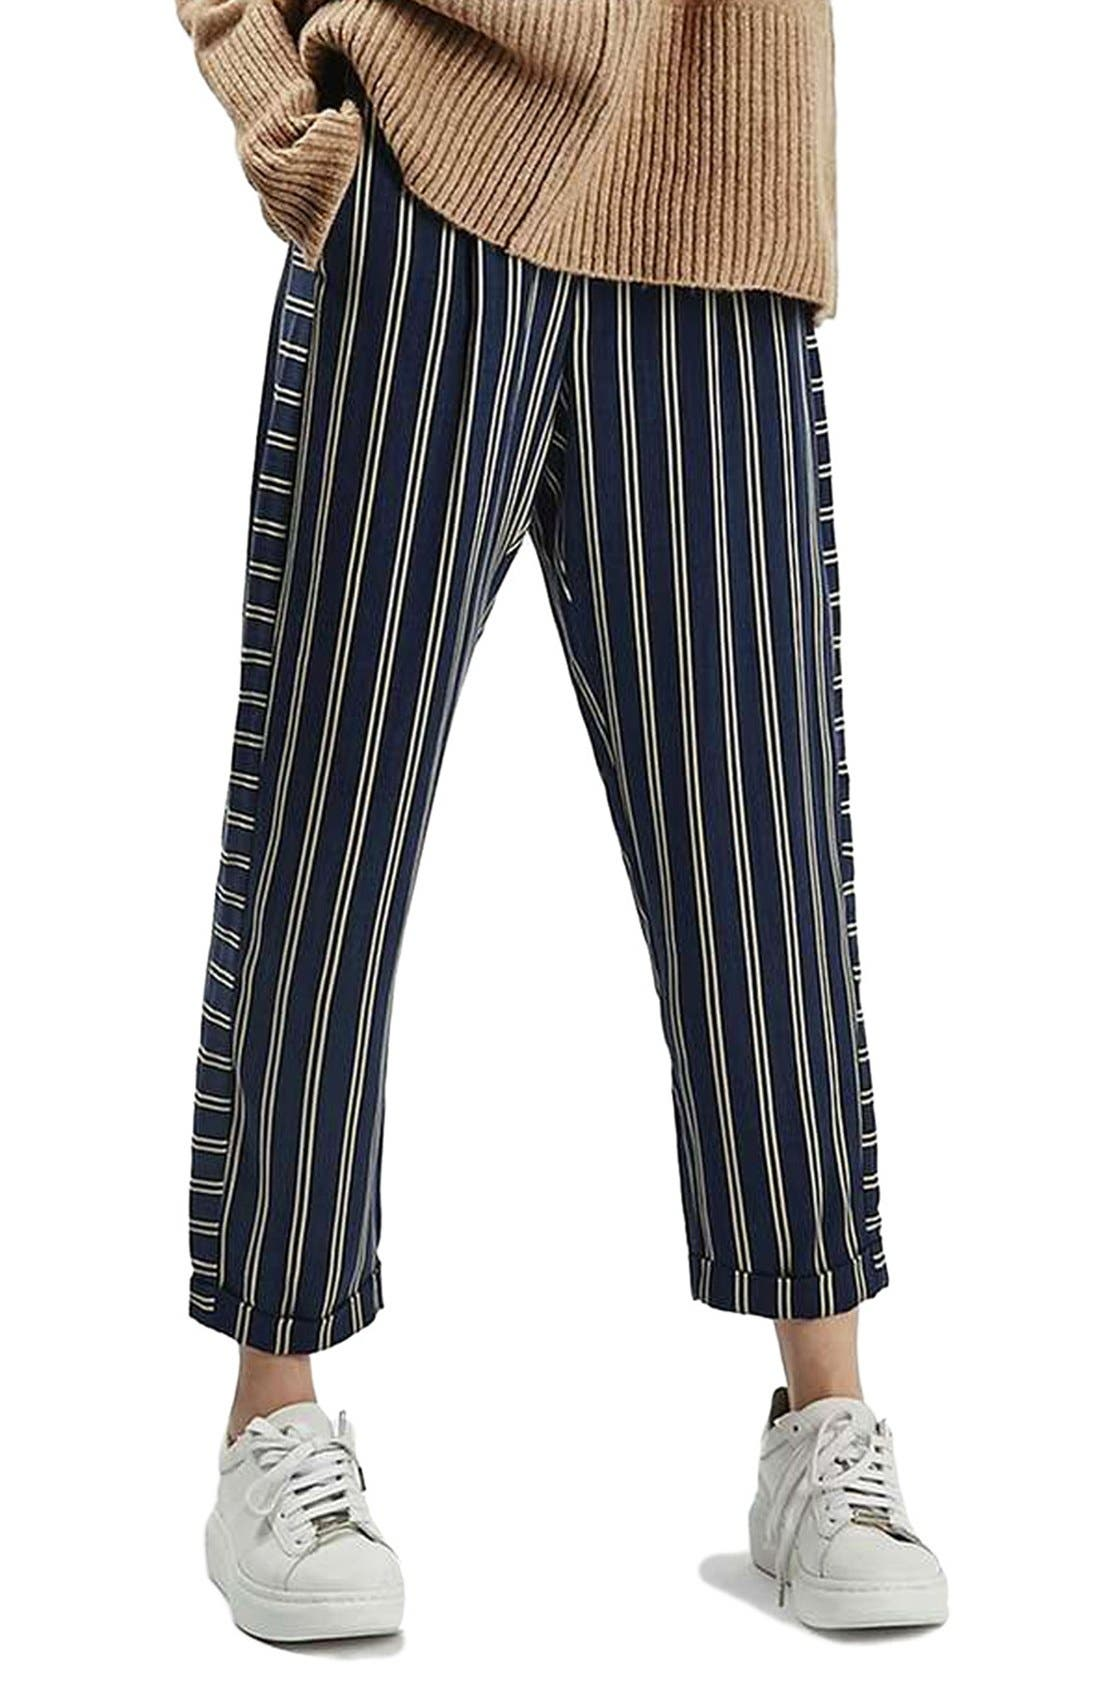 Main Image - Topshop Stripe Peg Trousers